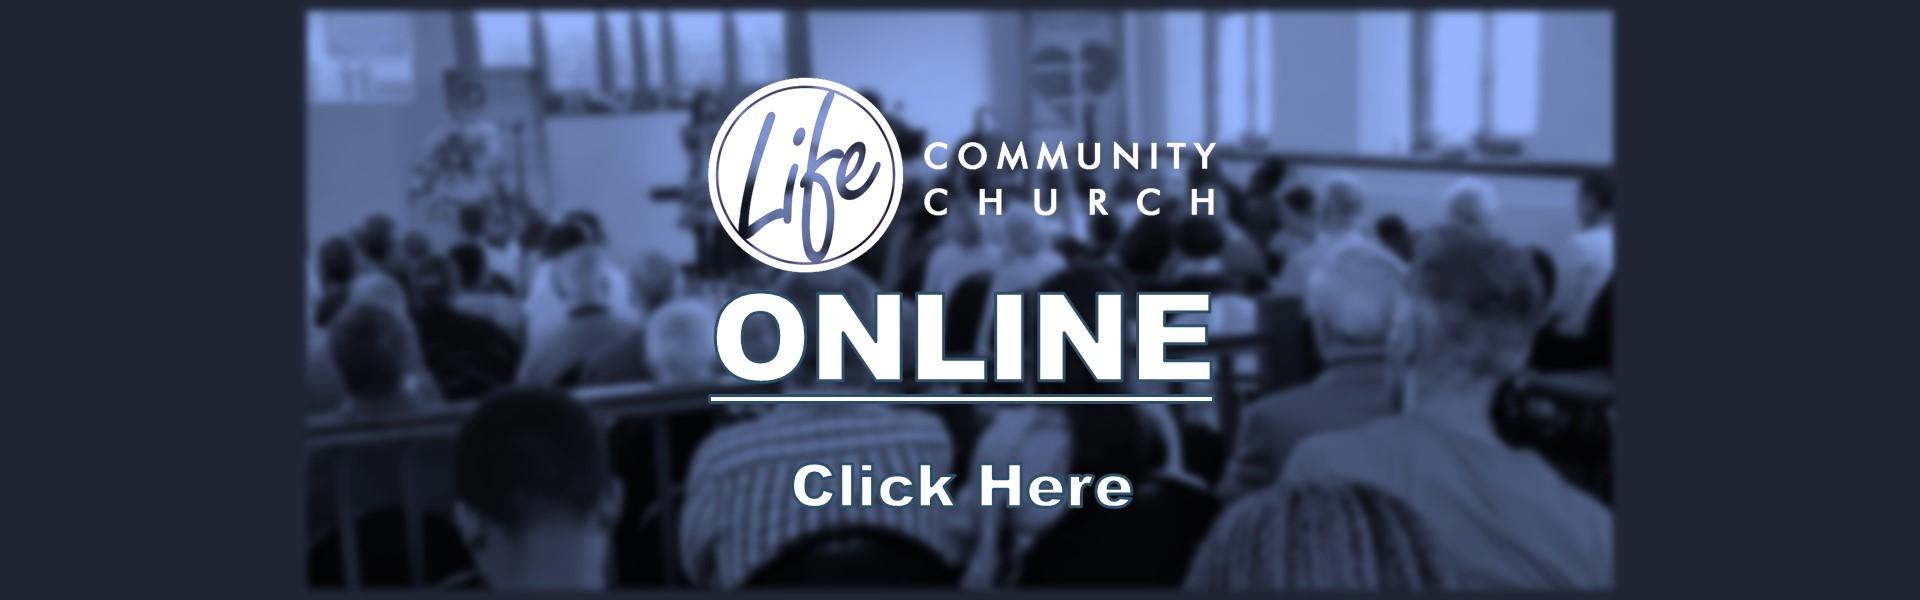 LCC Church Online Banner